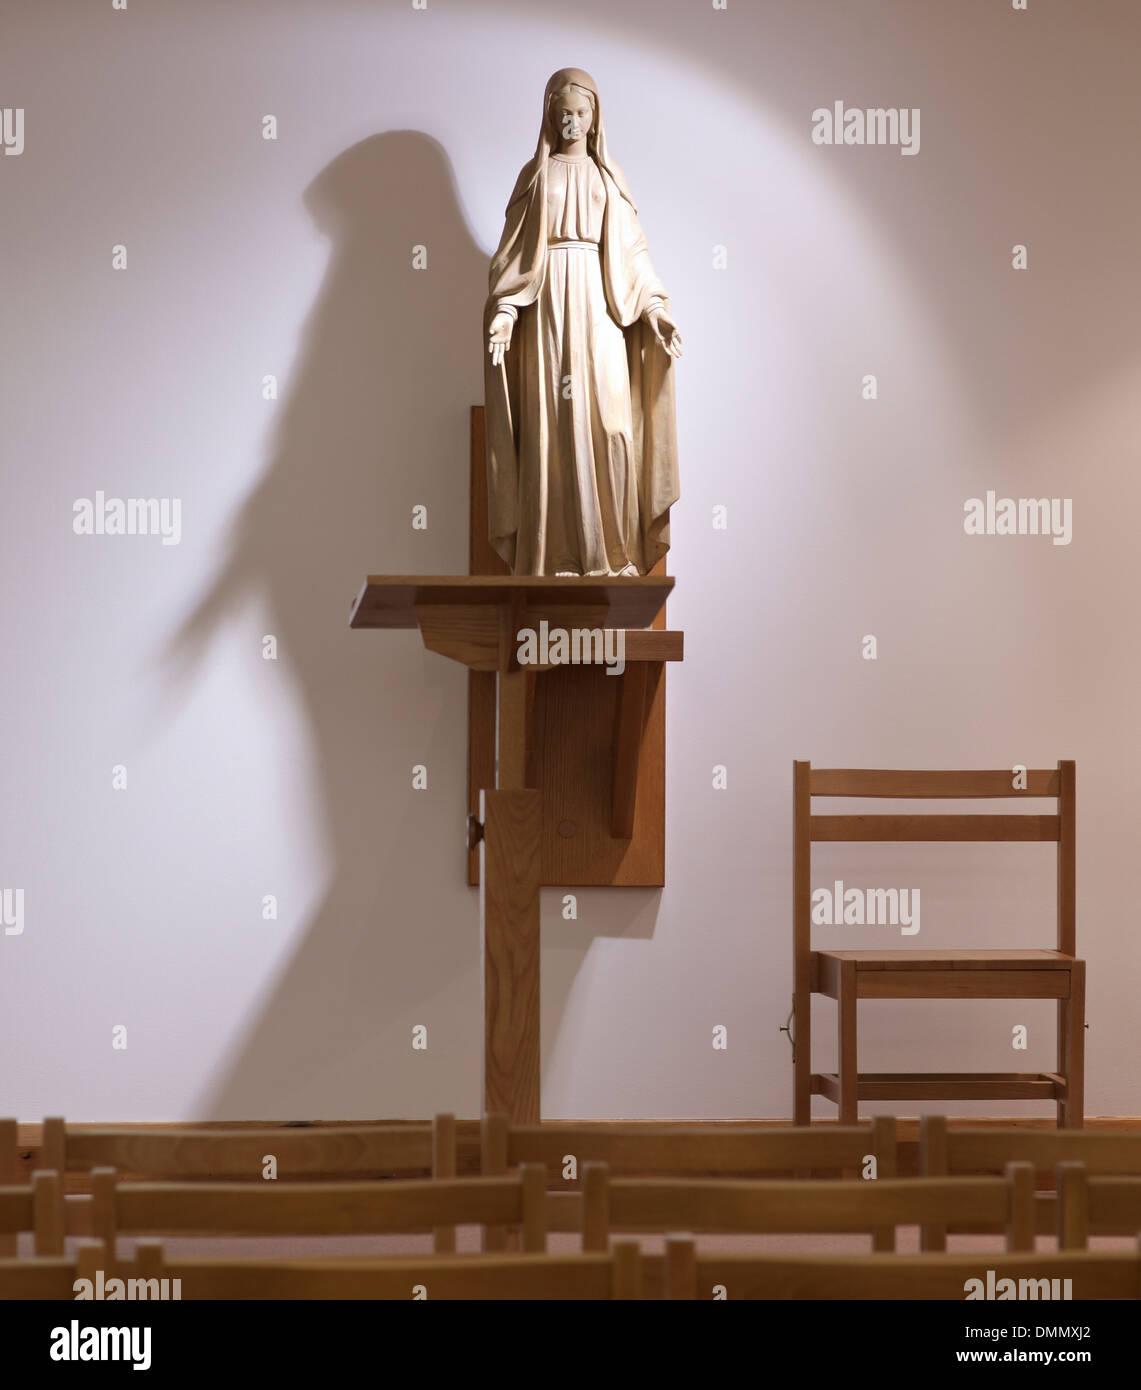 Mary virgin religion Christian Christianity holy spirit faith bible worship - Stock Image